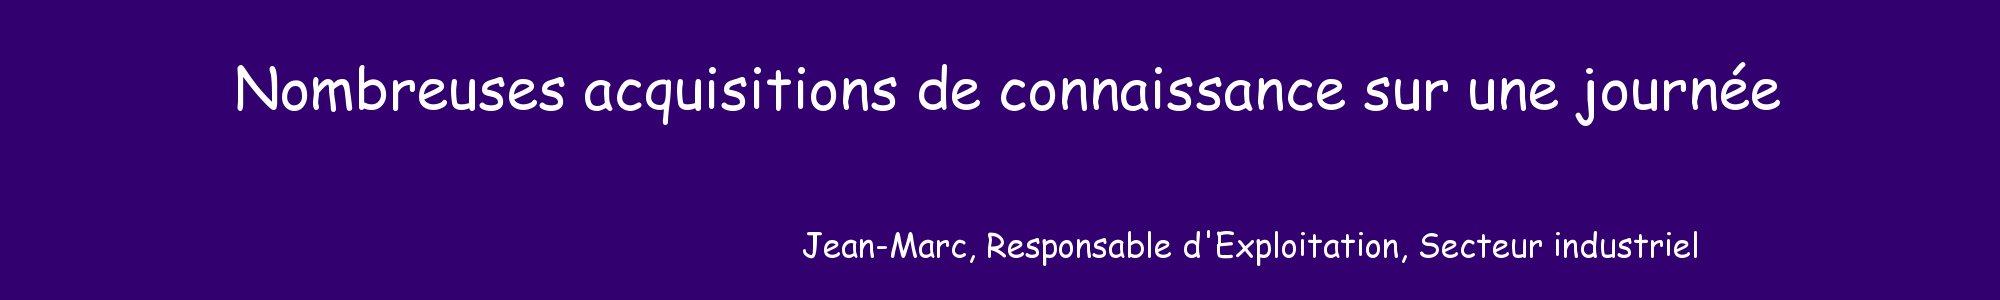 http://www.tablenego.com/wp-content/uploads/2017/01/JeanMarc2000X300.jpg